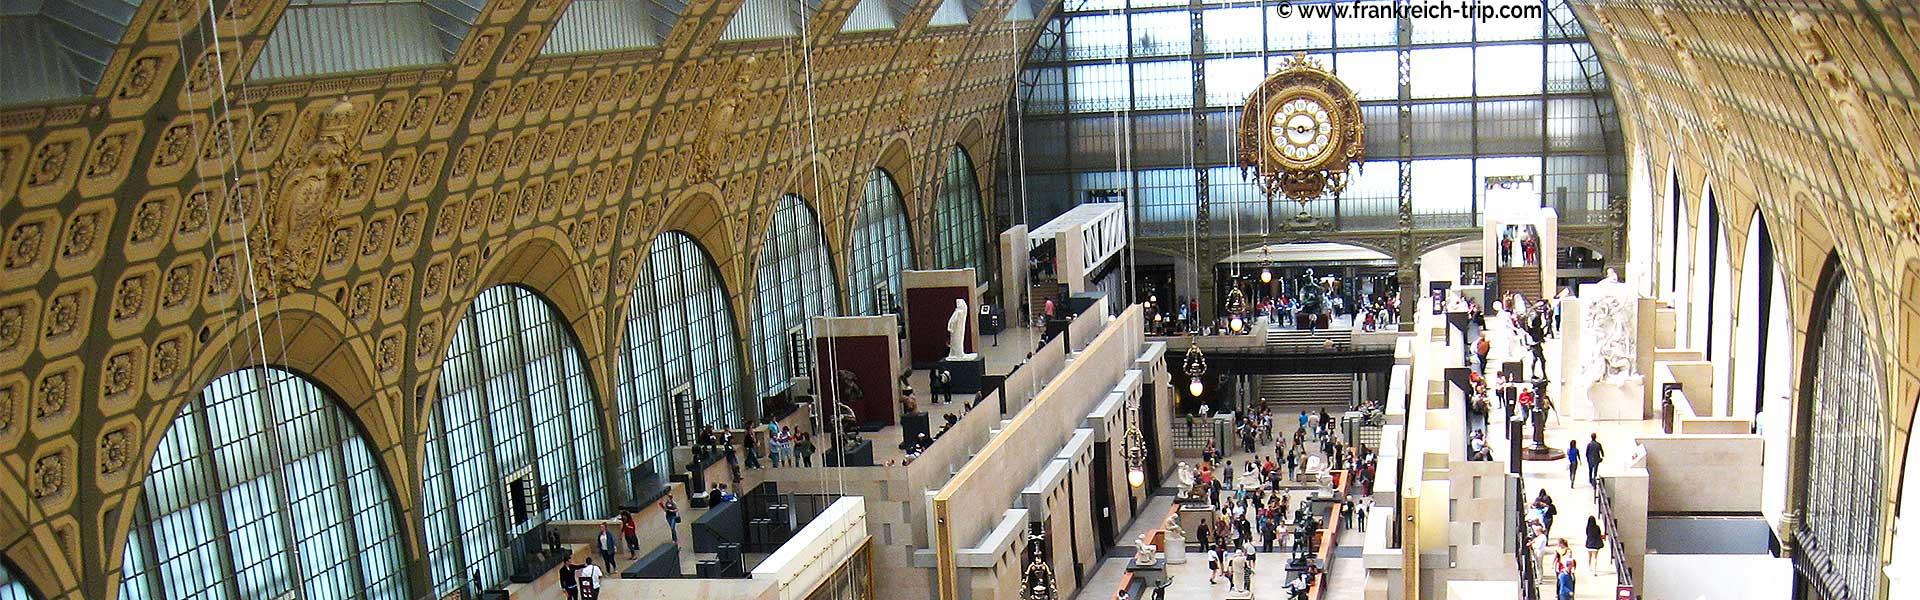 Musée d'Orsay - Museum in Paris